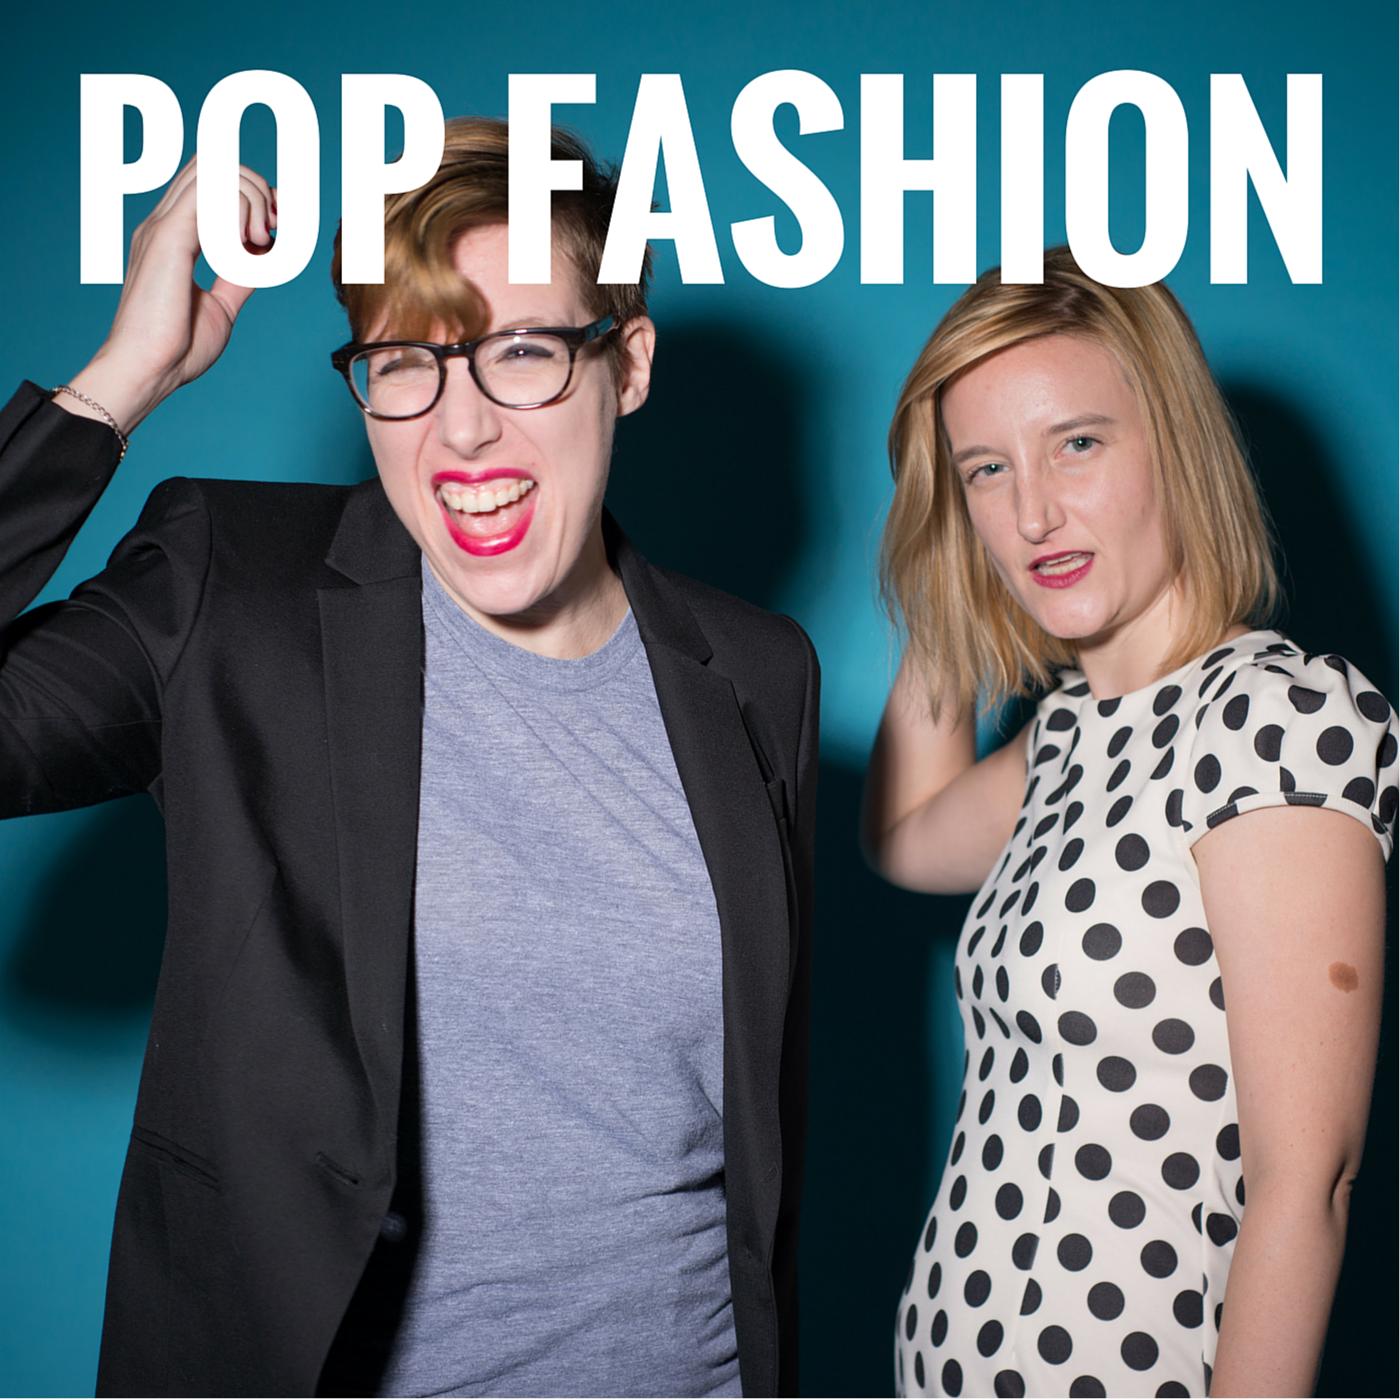 Pop Fashion show art